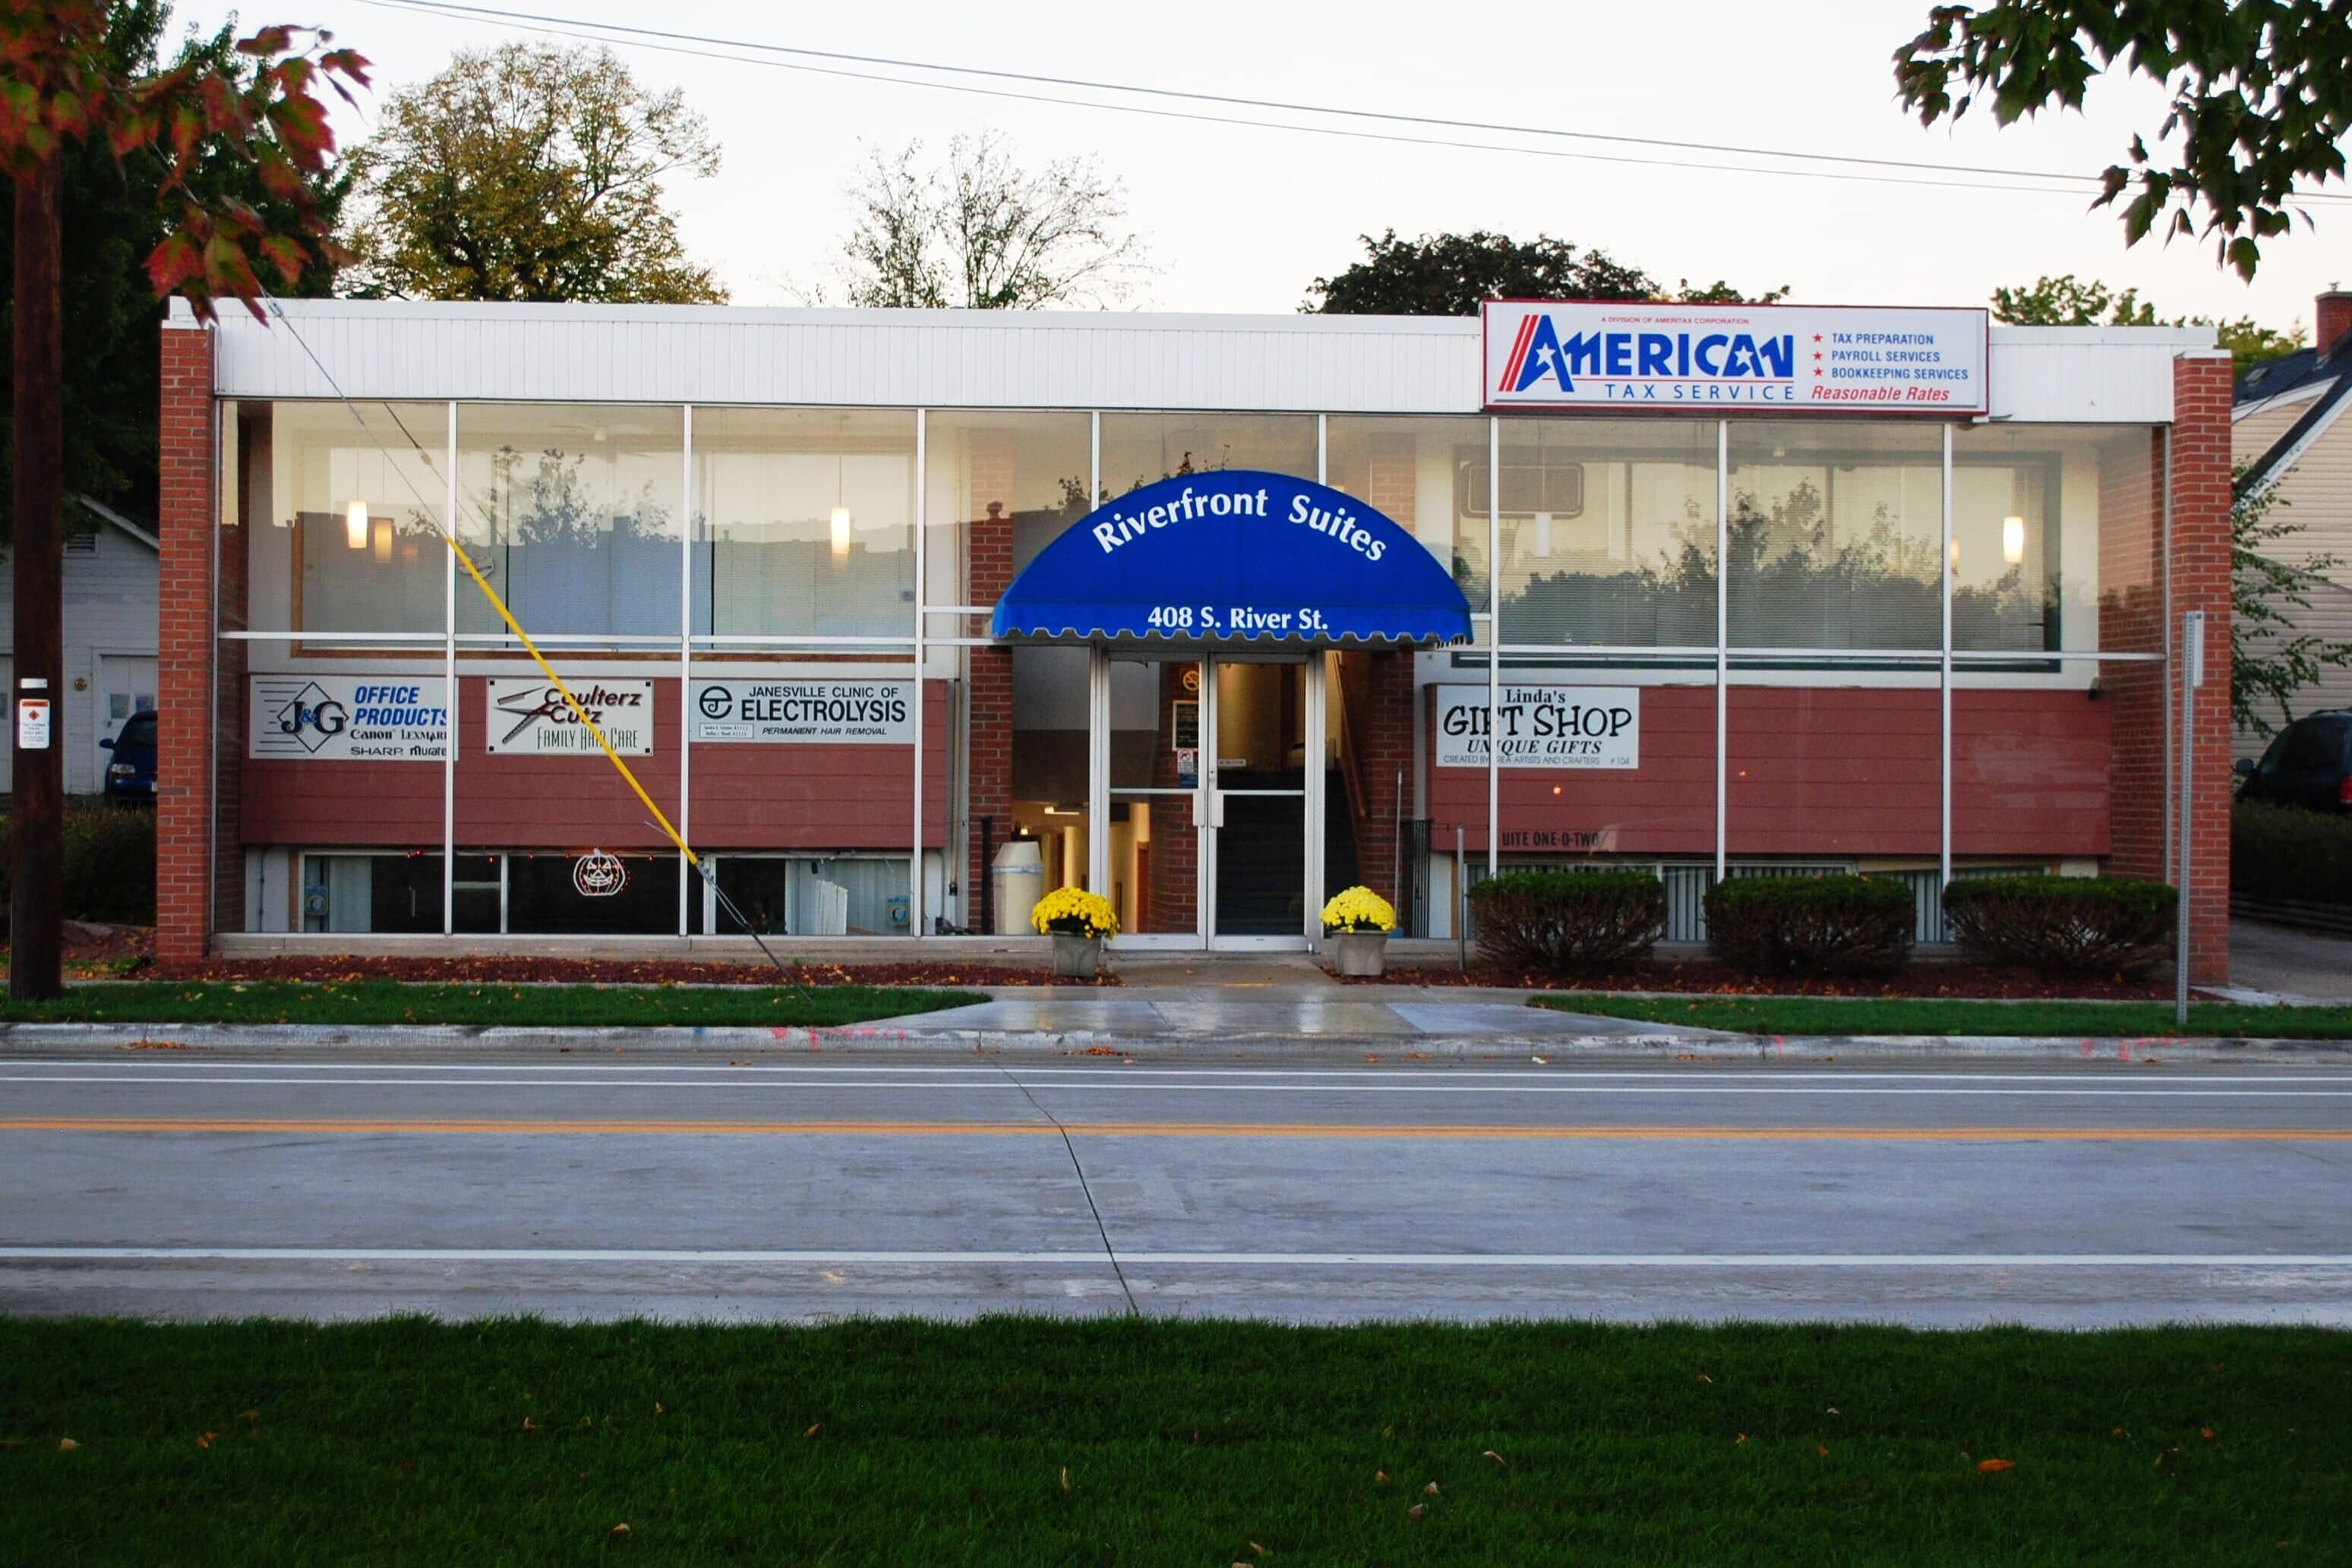 American Tax Service Building